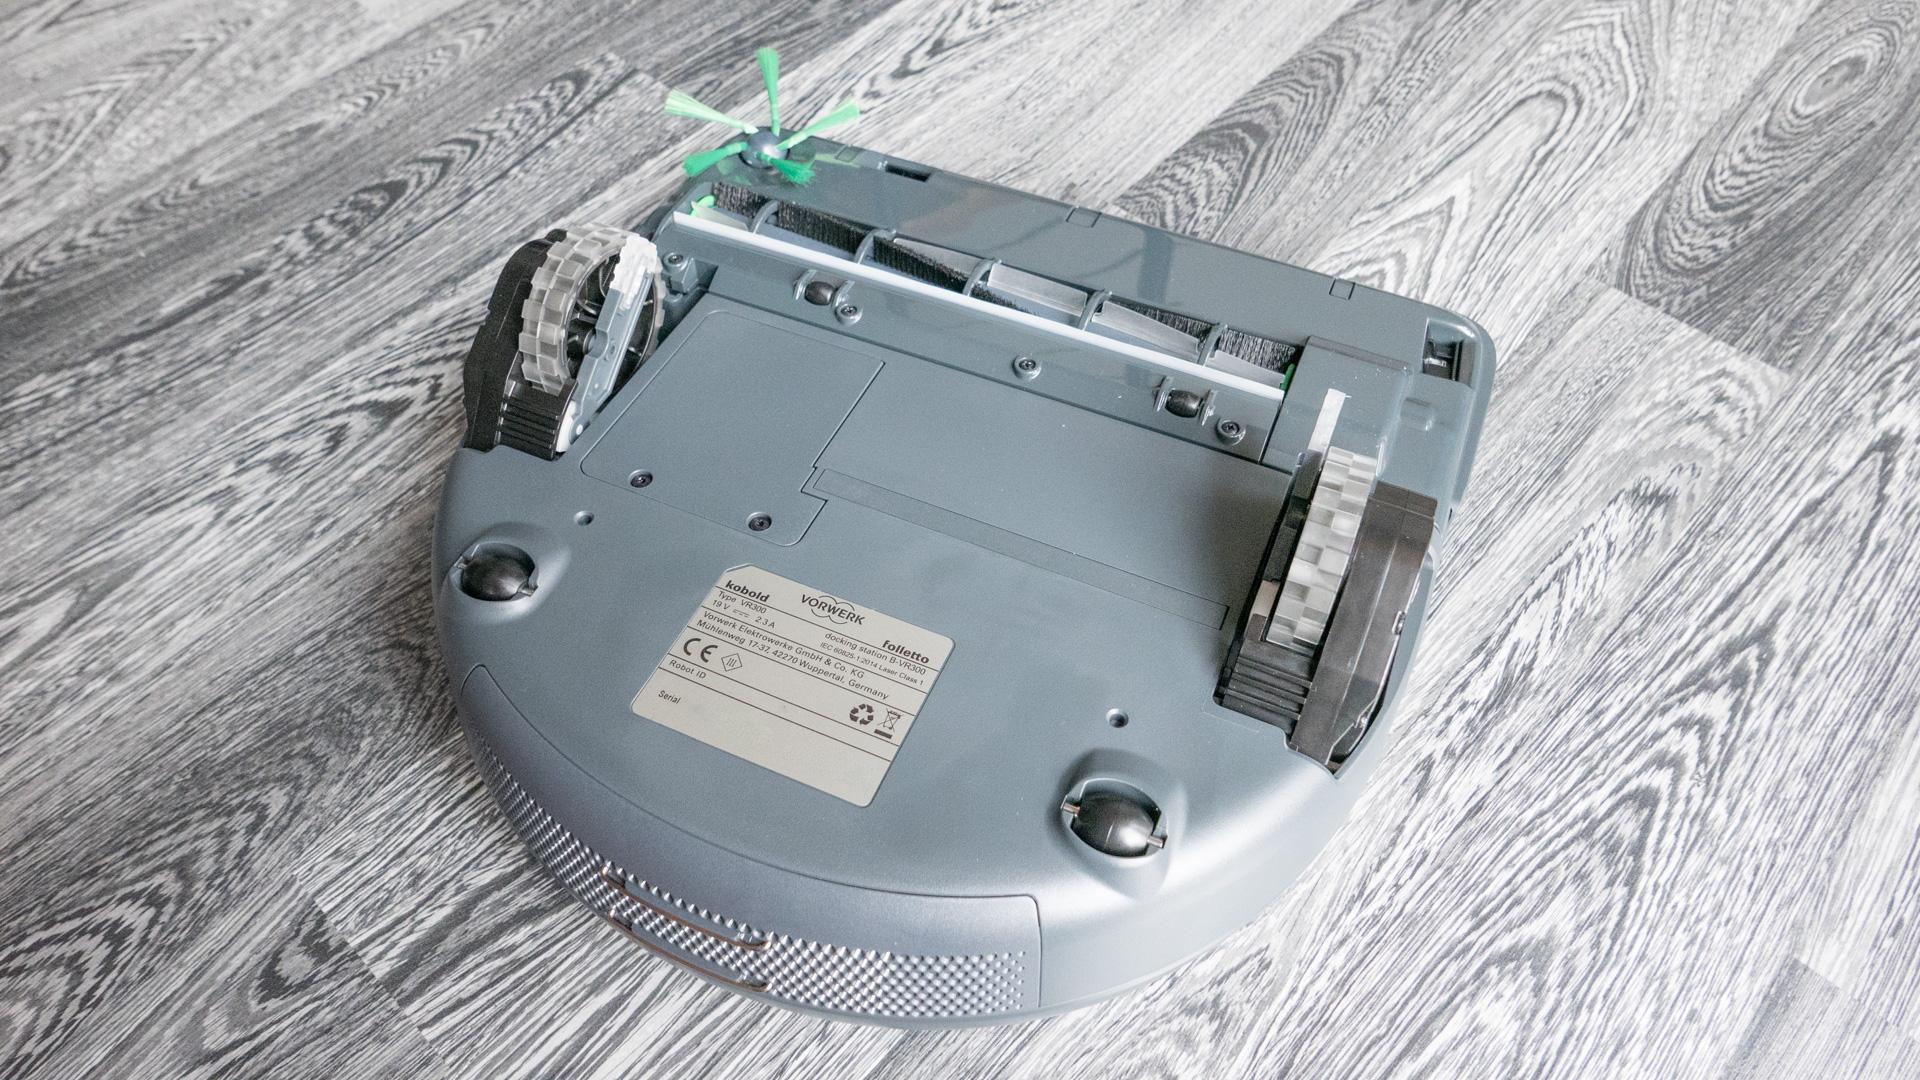 Vorwerk-VR300-Details-17